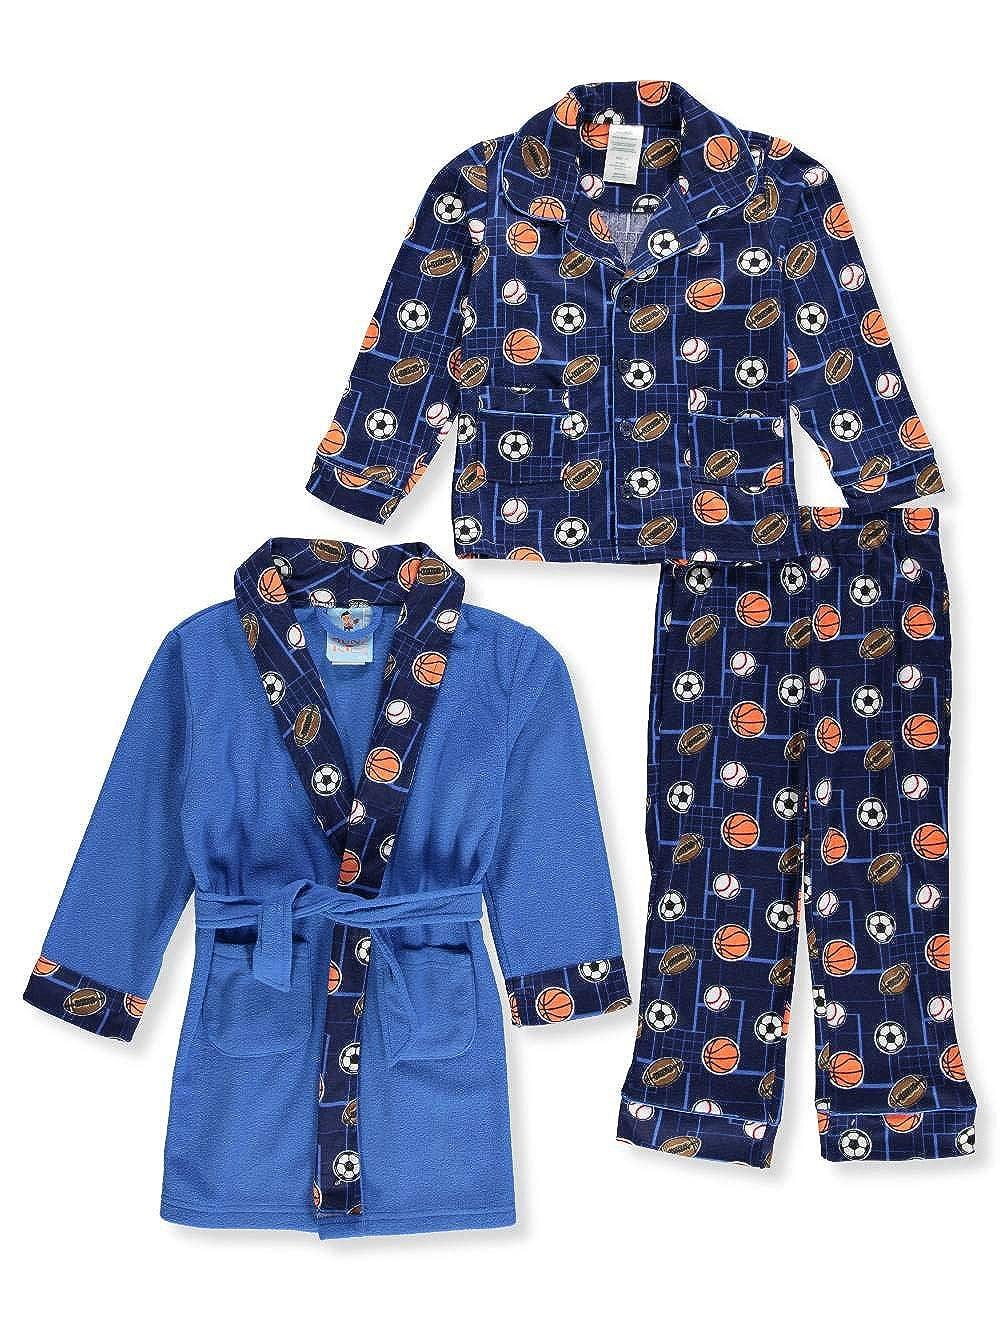 Bunz Kidz Little Boys' Toddler 2-Piece Pajamas with Robe - Blue/Multi, 3t